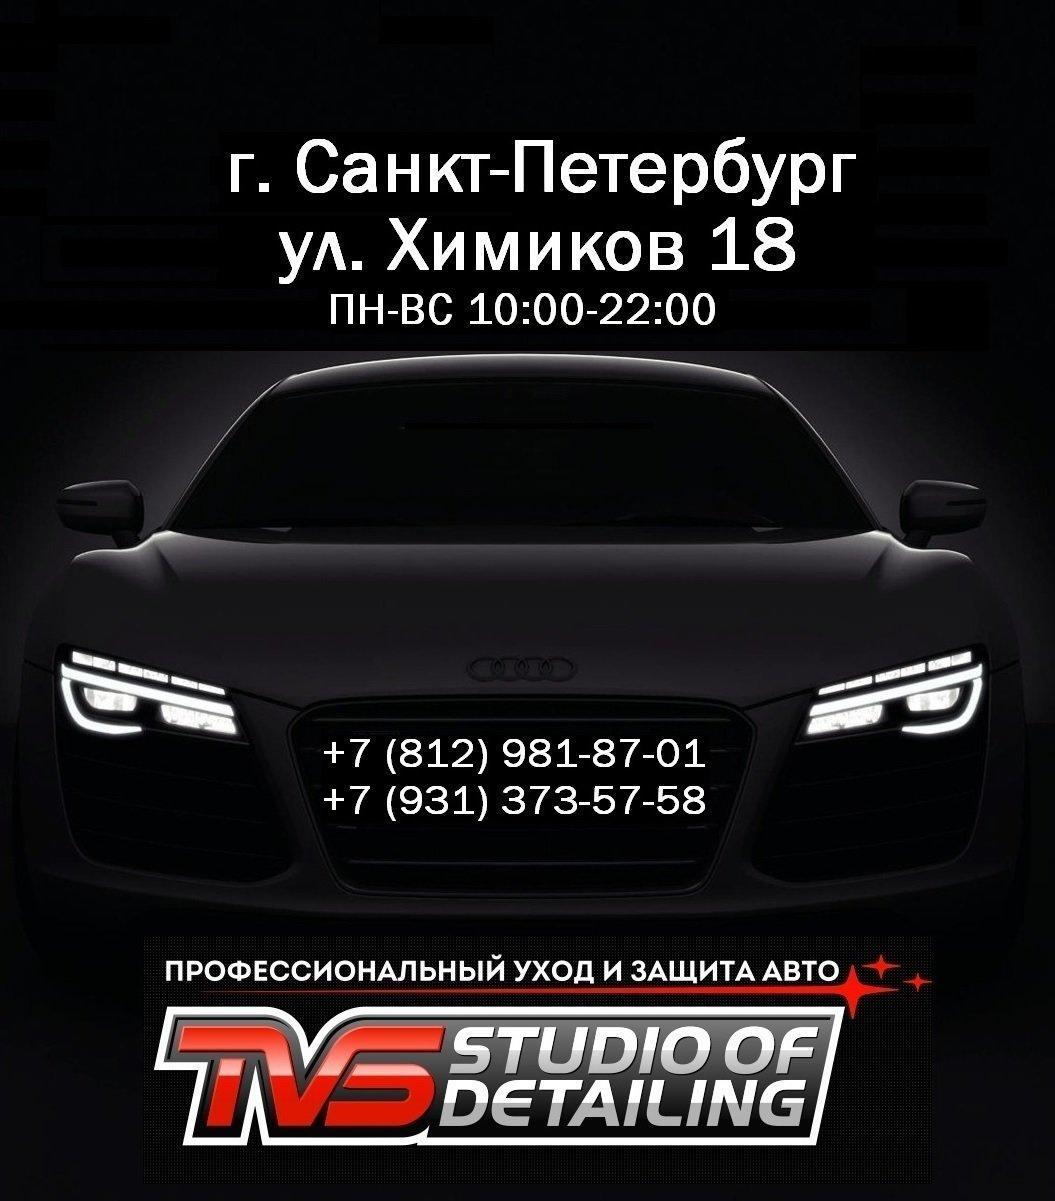 фотография Салона детейлинга TVS Studio of Detailing на улице Химиков